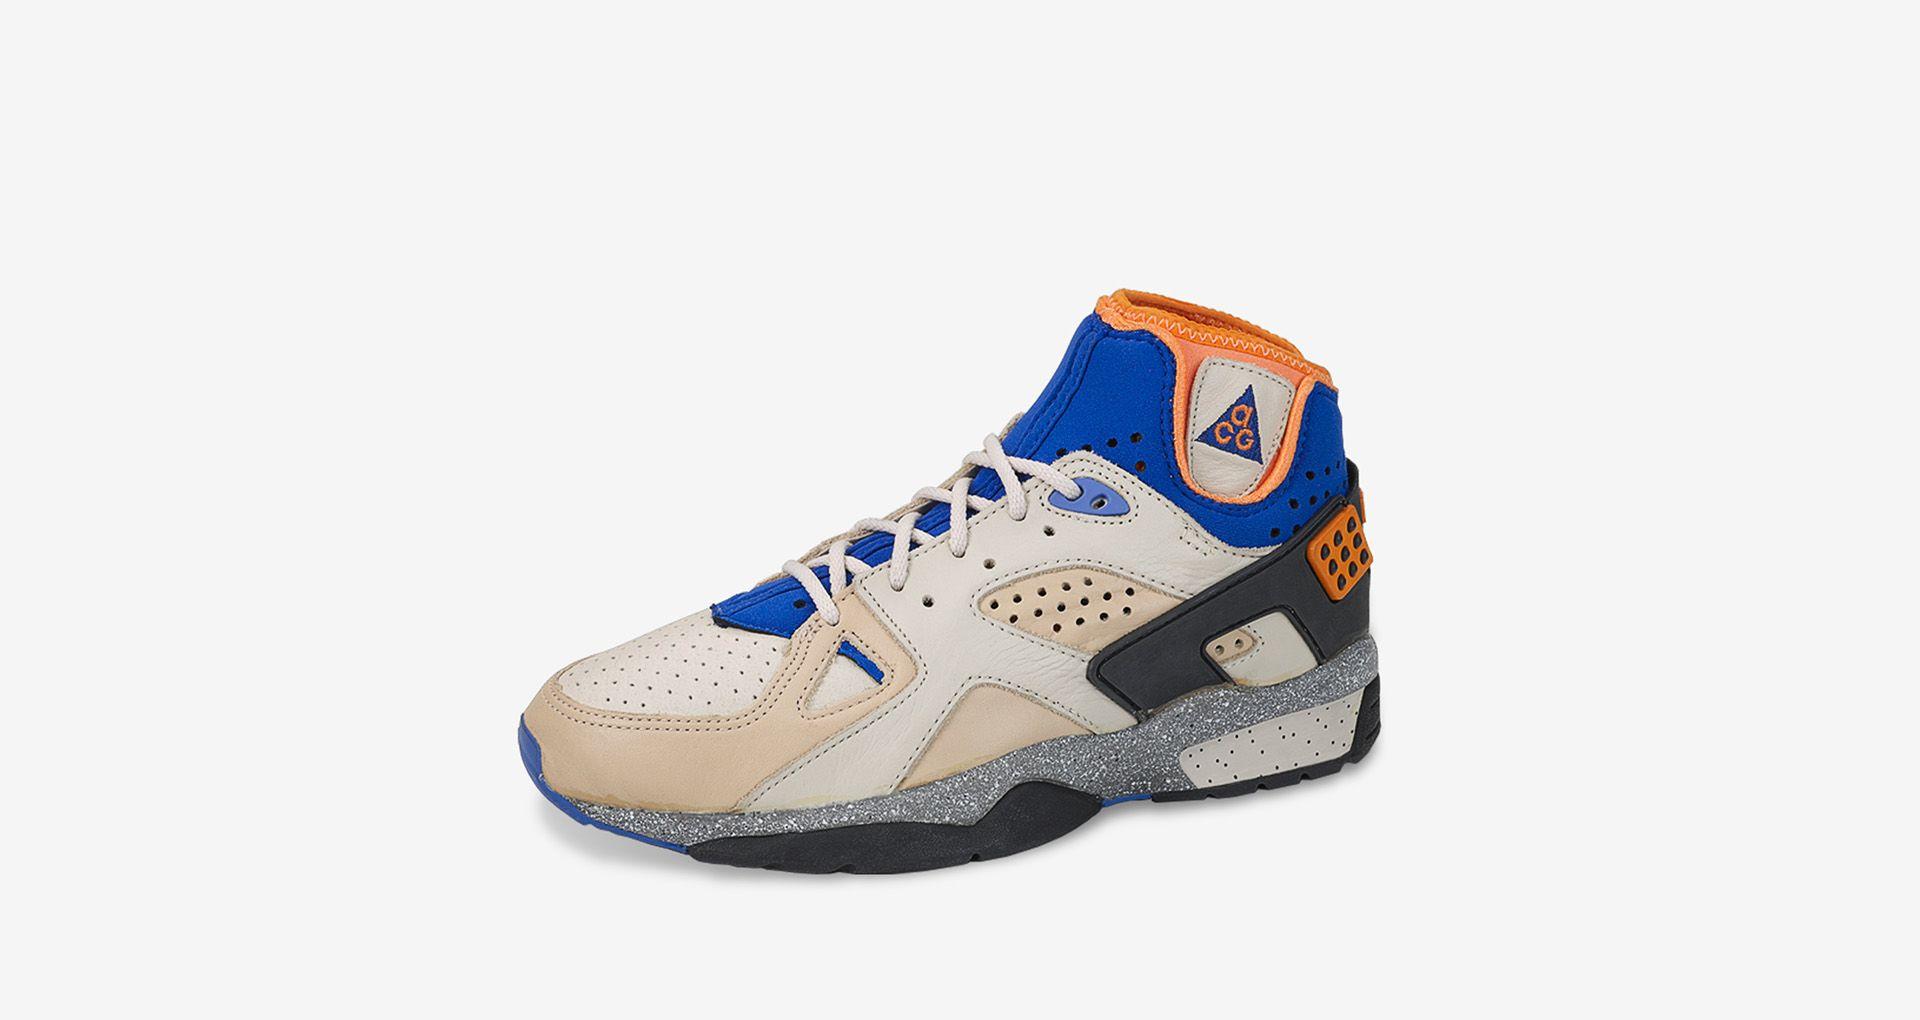 89d272264744 Nike Lebron 15  Mowabb  Release Date. Nike+ SNKRS